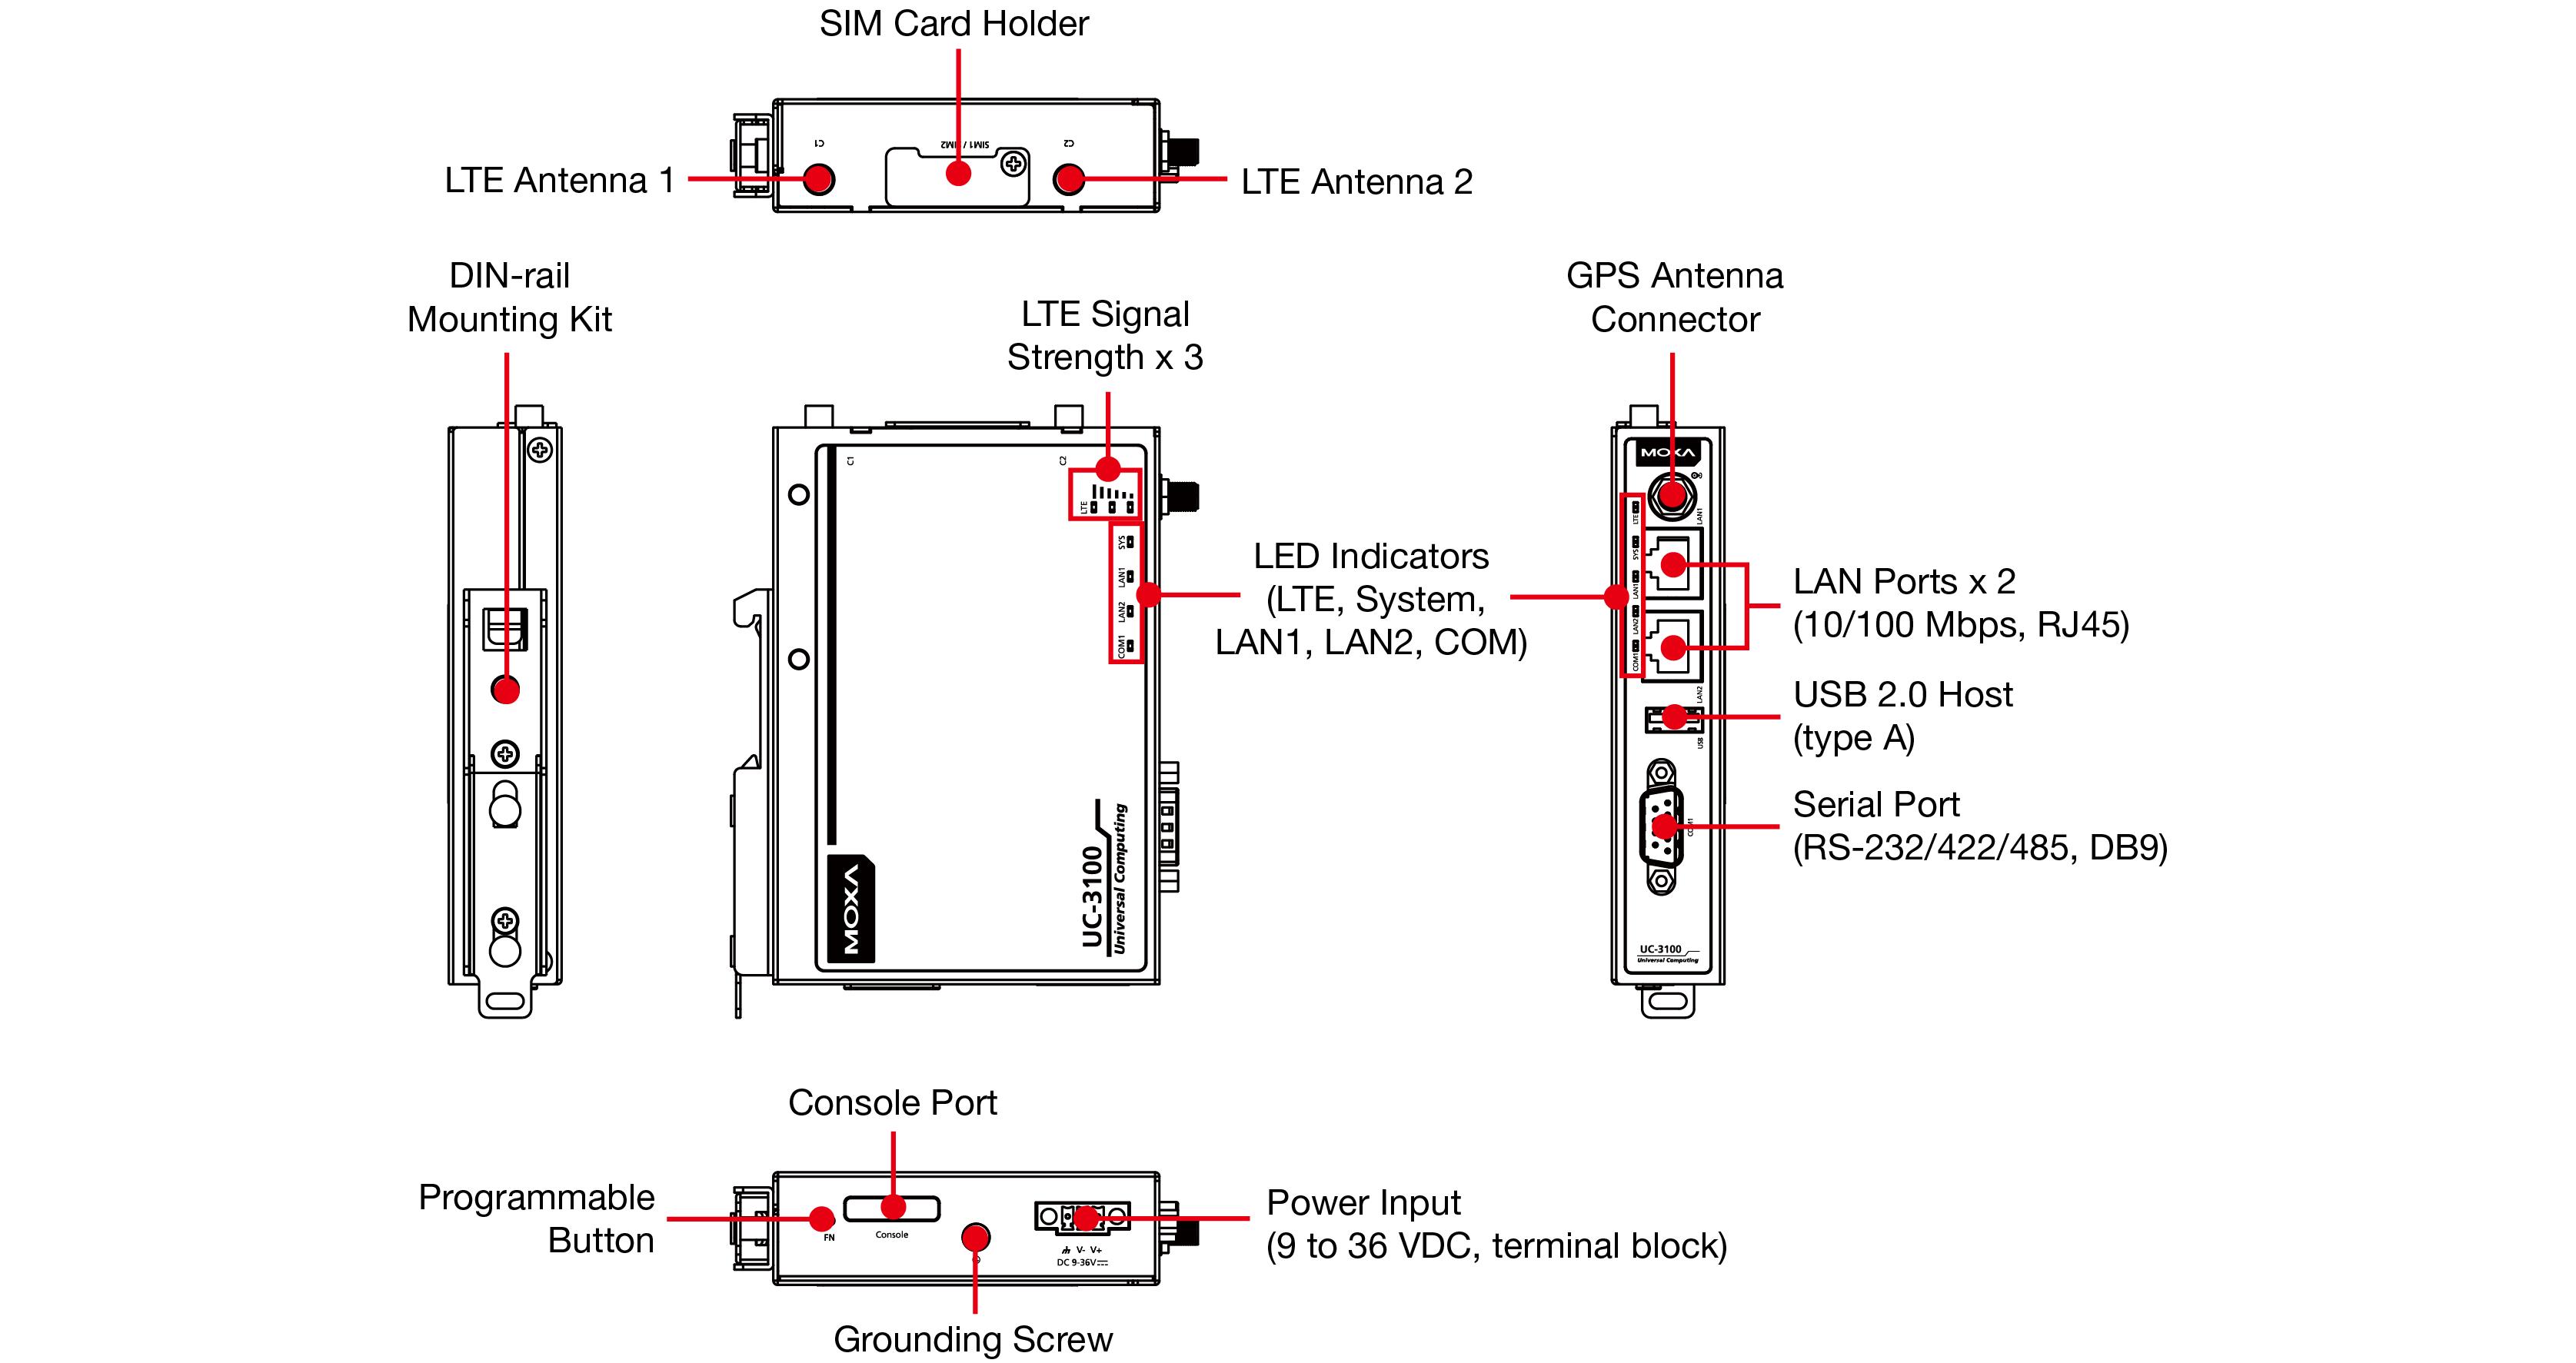 UC-3100 Series - Arm-Based Computers | MOXA